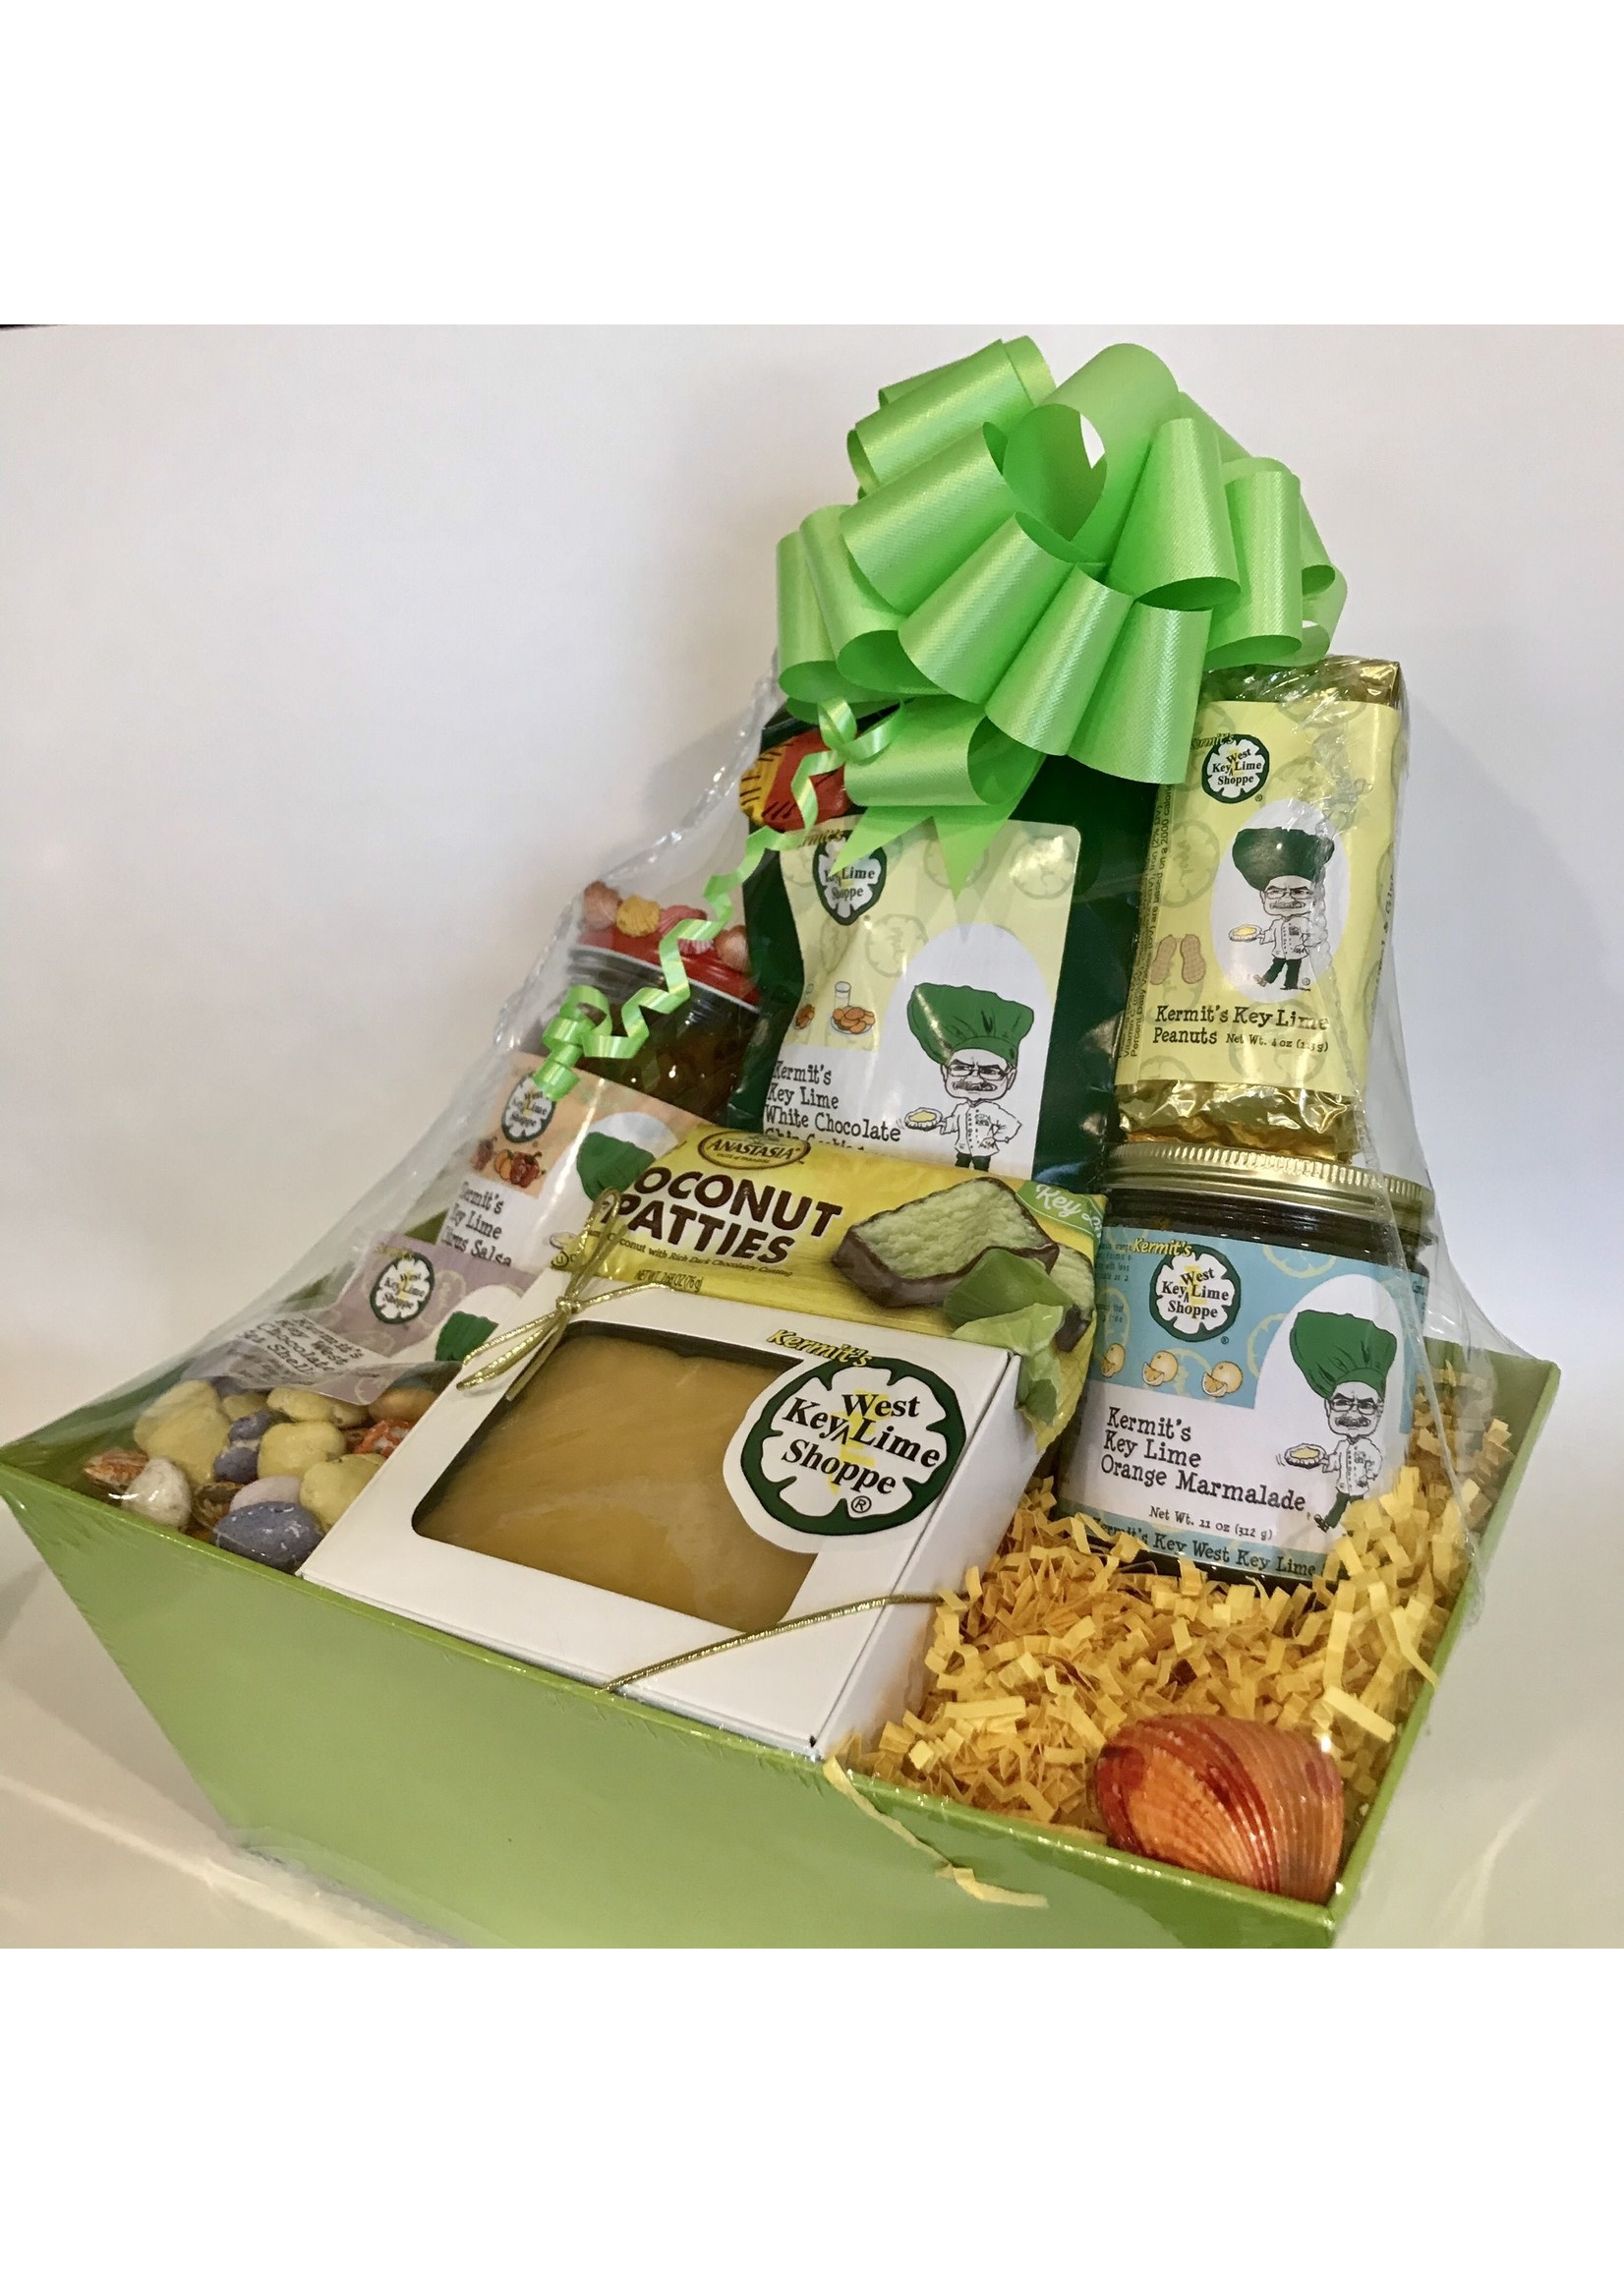 Kermit's Poinciana Gift Basket